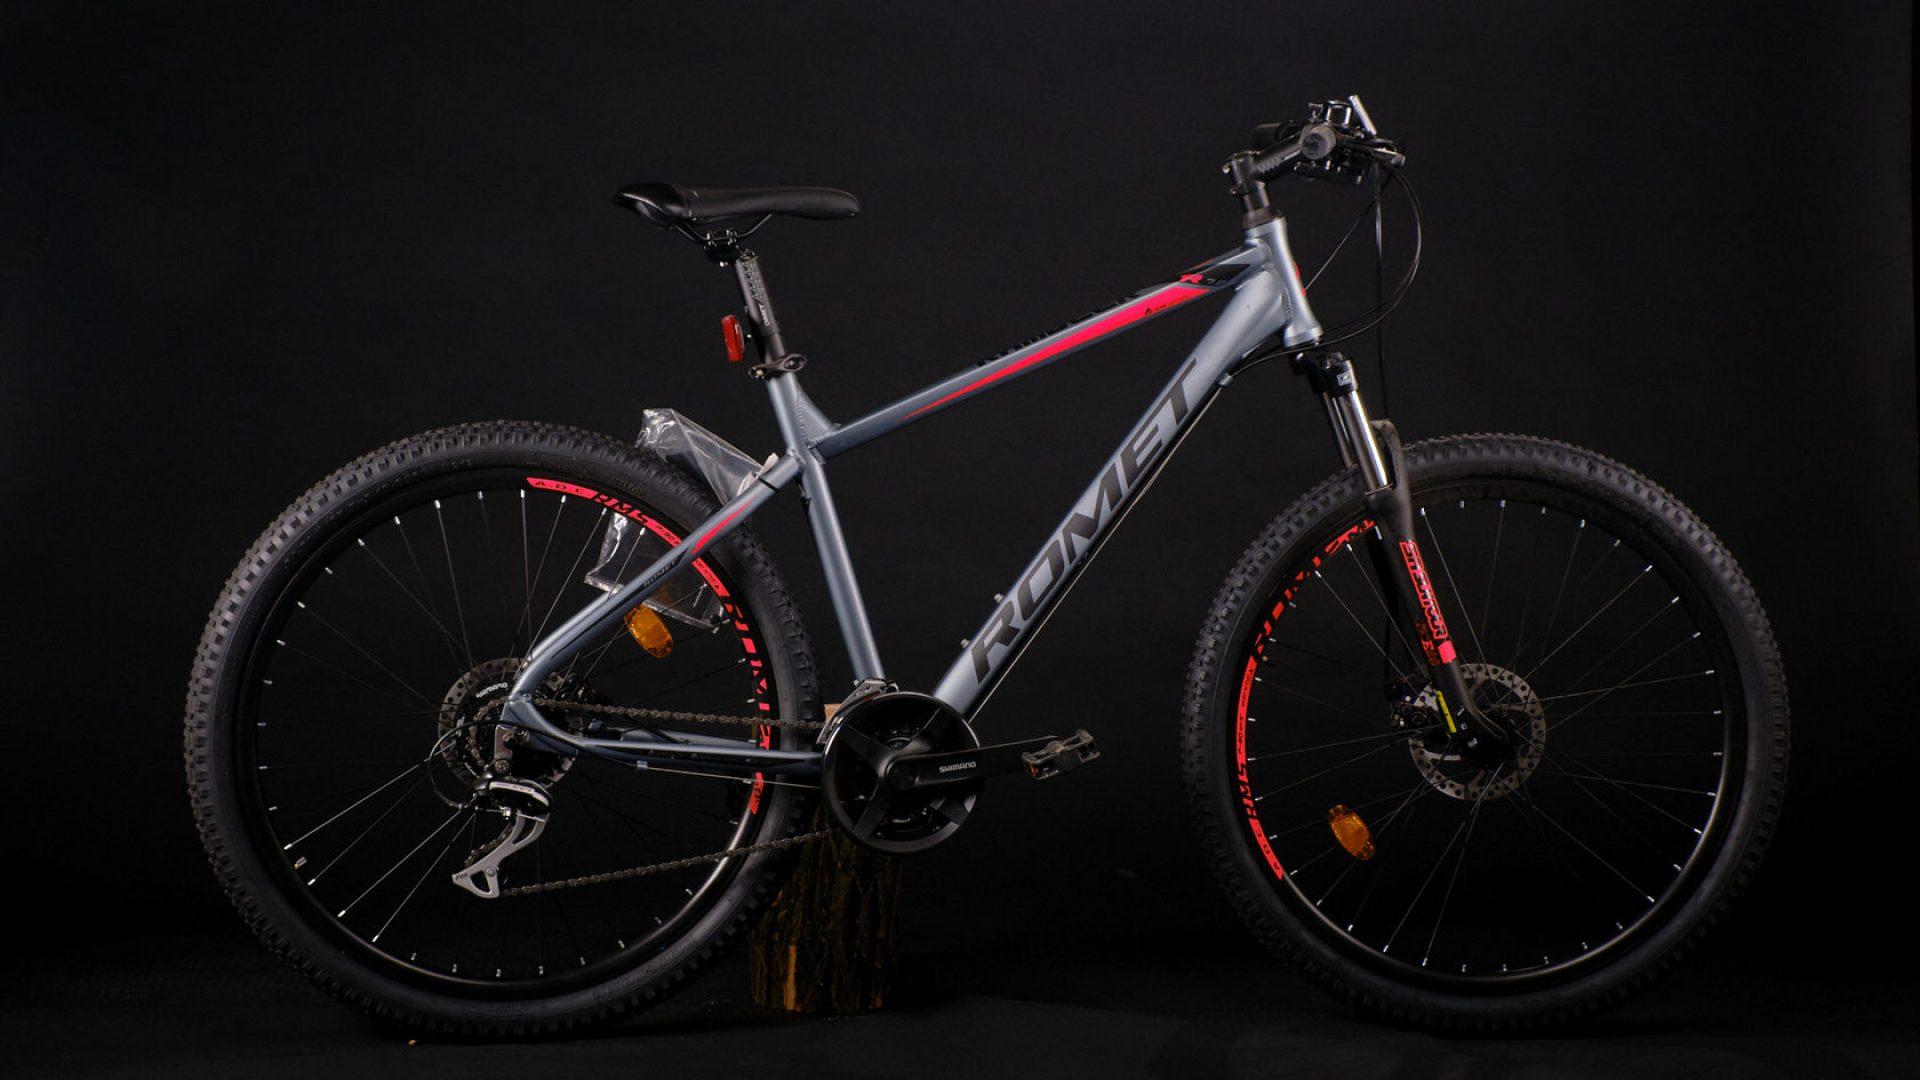 Предметная фотосъемка — Велосипед